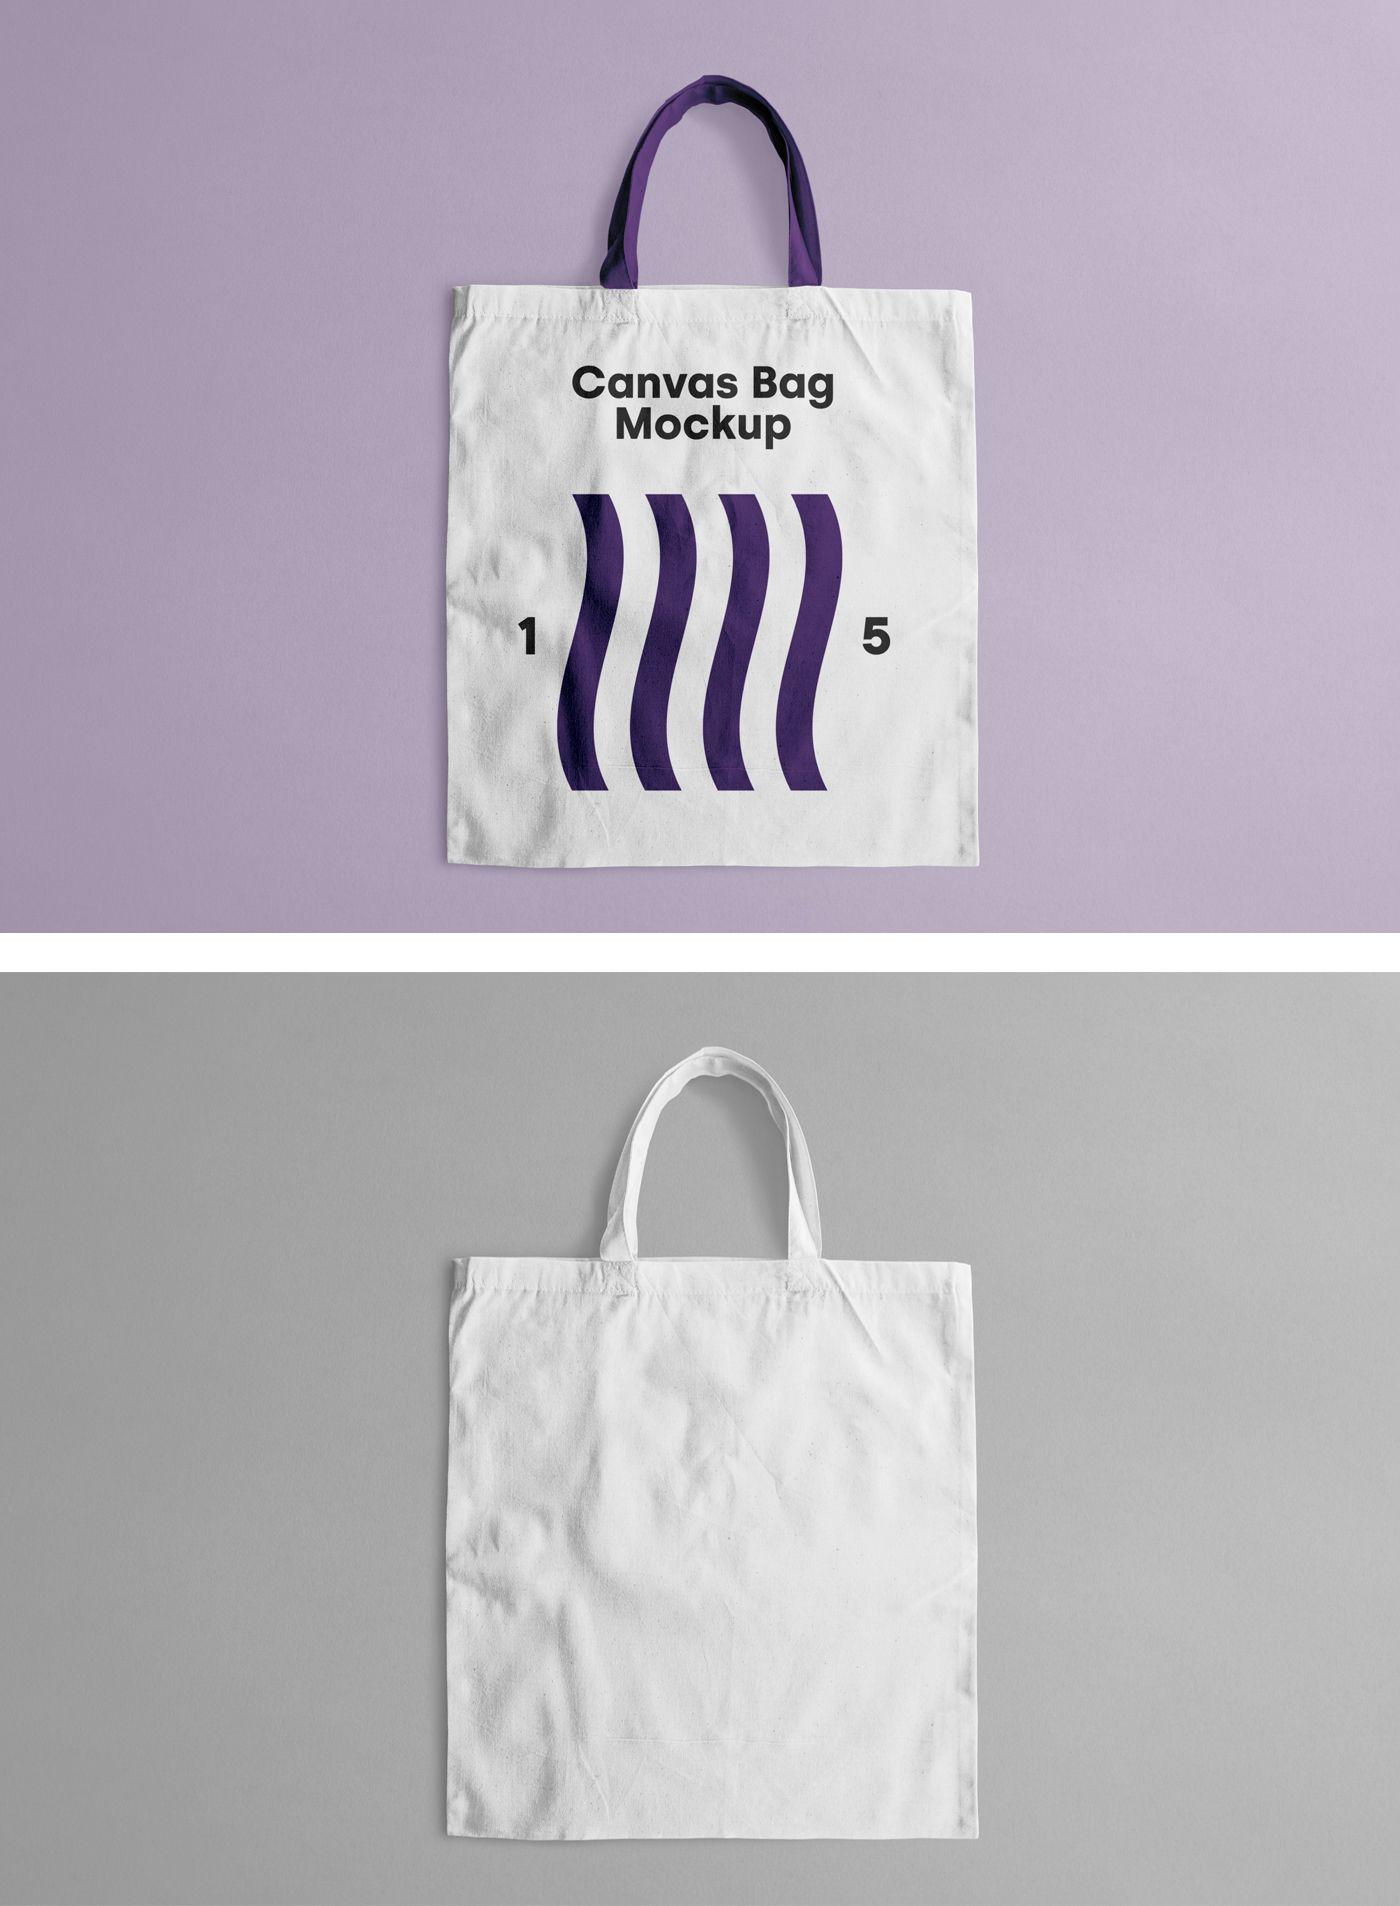 Download Canvas Tote Bag Mockup Mr Mockup Graphic Design Freebies In 2020 Bag Mockup Tote Bag Canvas Tote